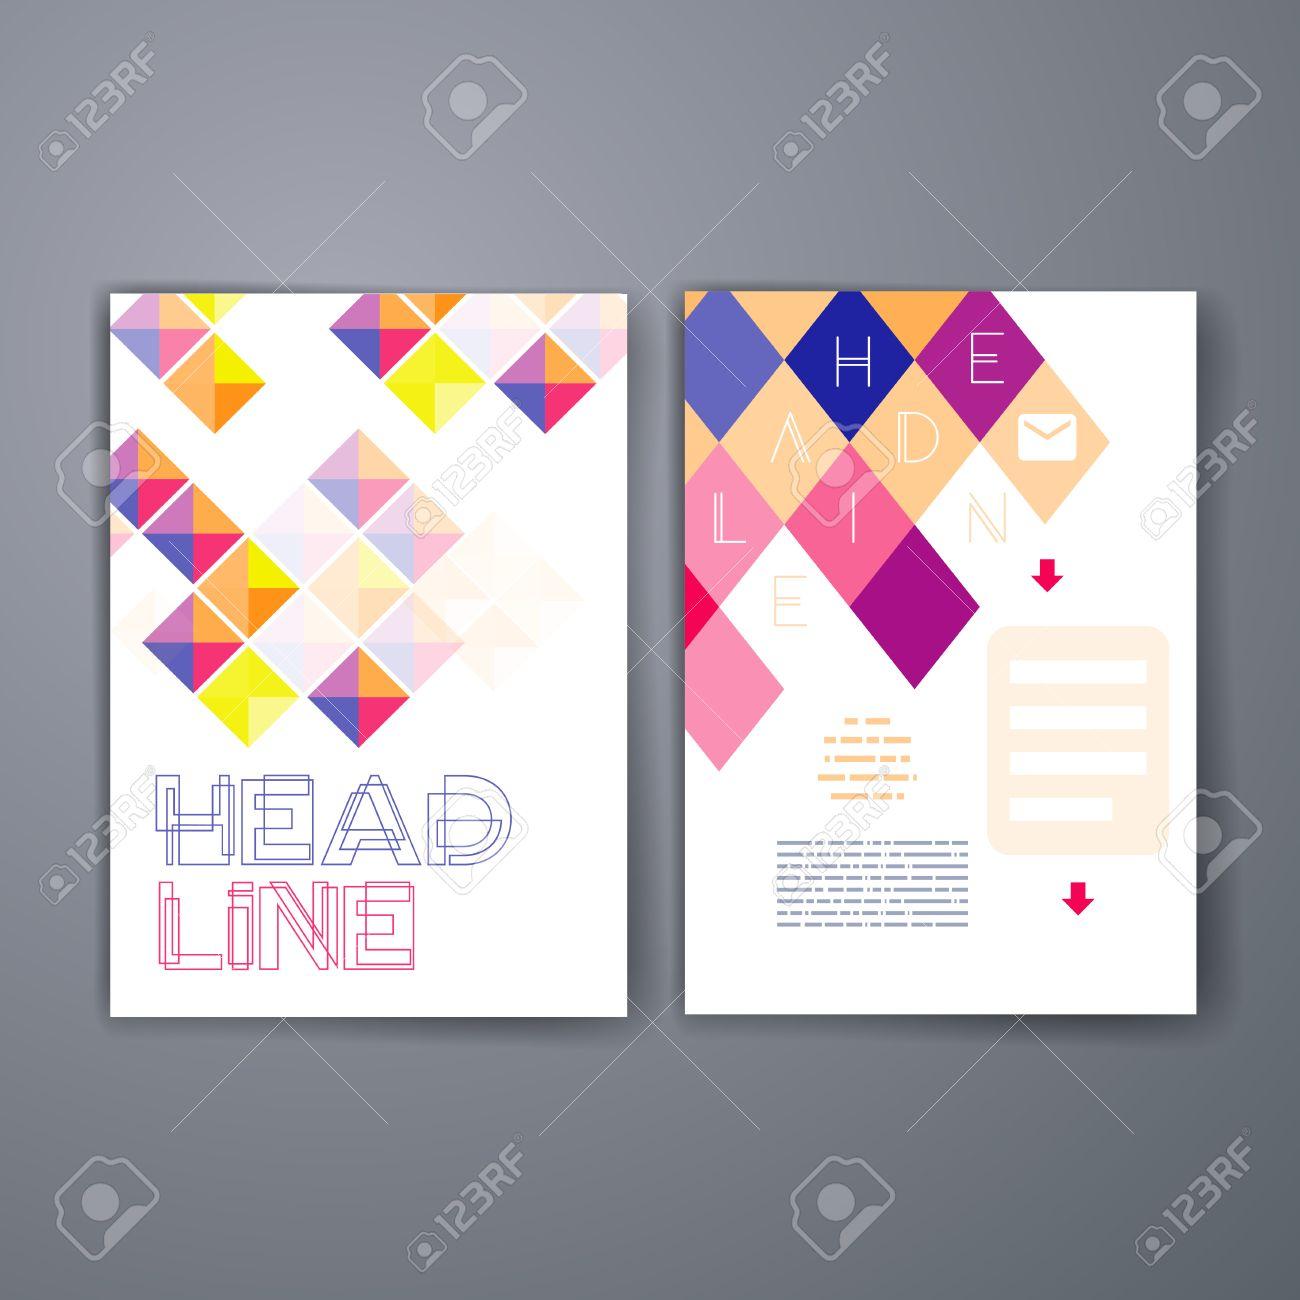 templates vector flyer brochure magazine cover template can templates vector flyer brochure magazine cover template can use for print and marketing